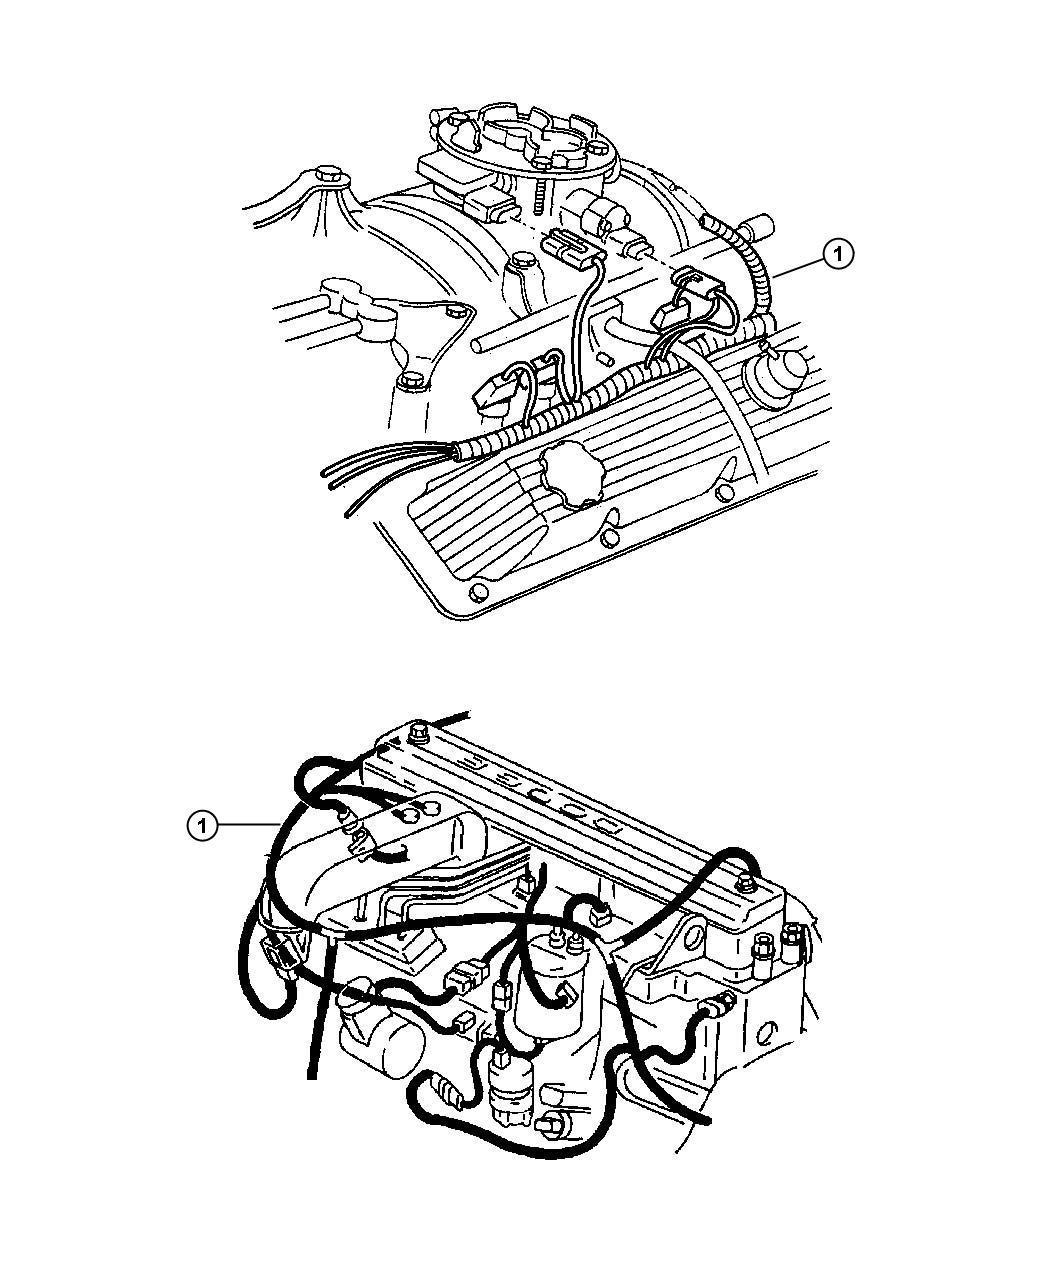 Dodge Ram 1500 Wiring. Engine. California emission